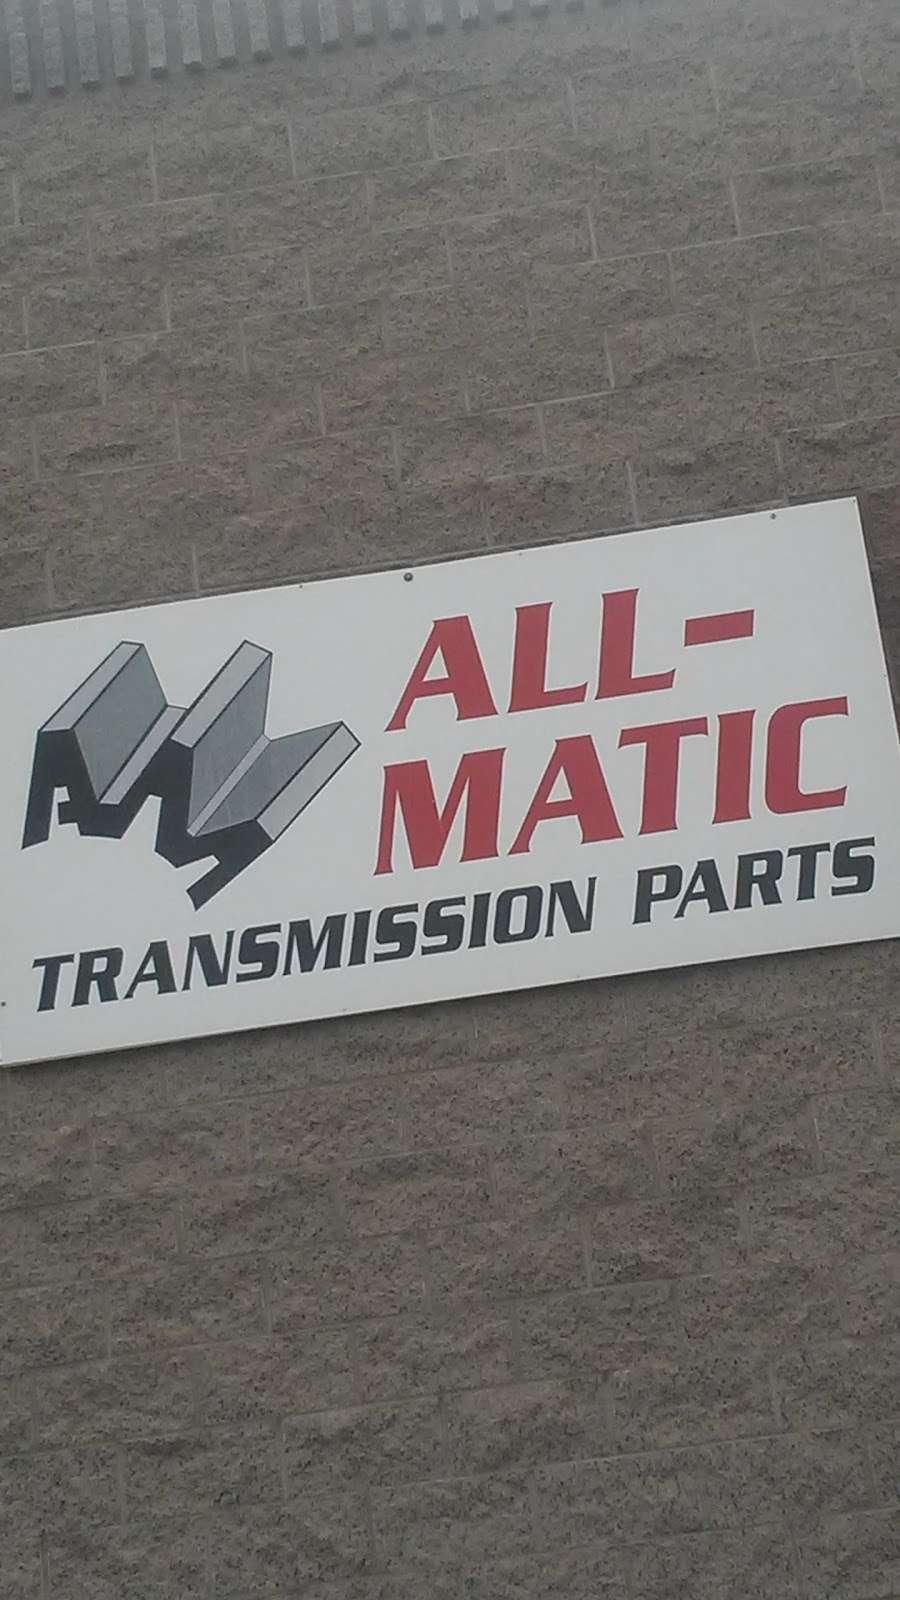 Allmatic Transmission Parts - car repair  | Photo 4 of 4 | Address: 241 W Commerce Park Ct, North Las Vegas, NV 89032, USA | Phone: (702) 316-9895